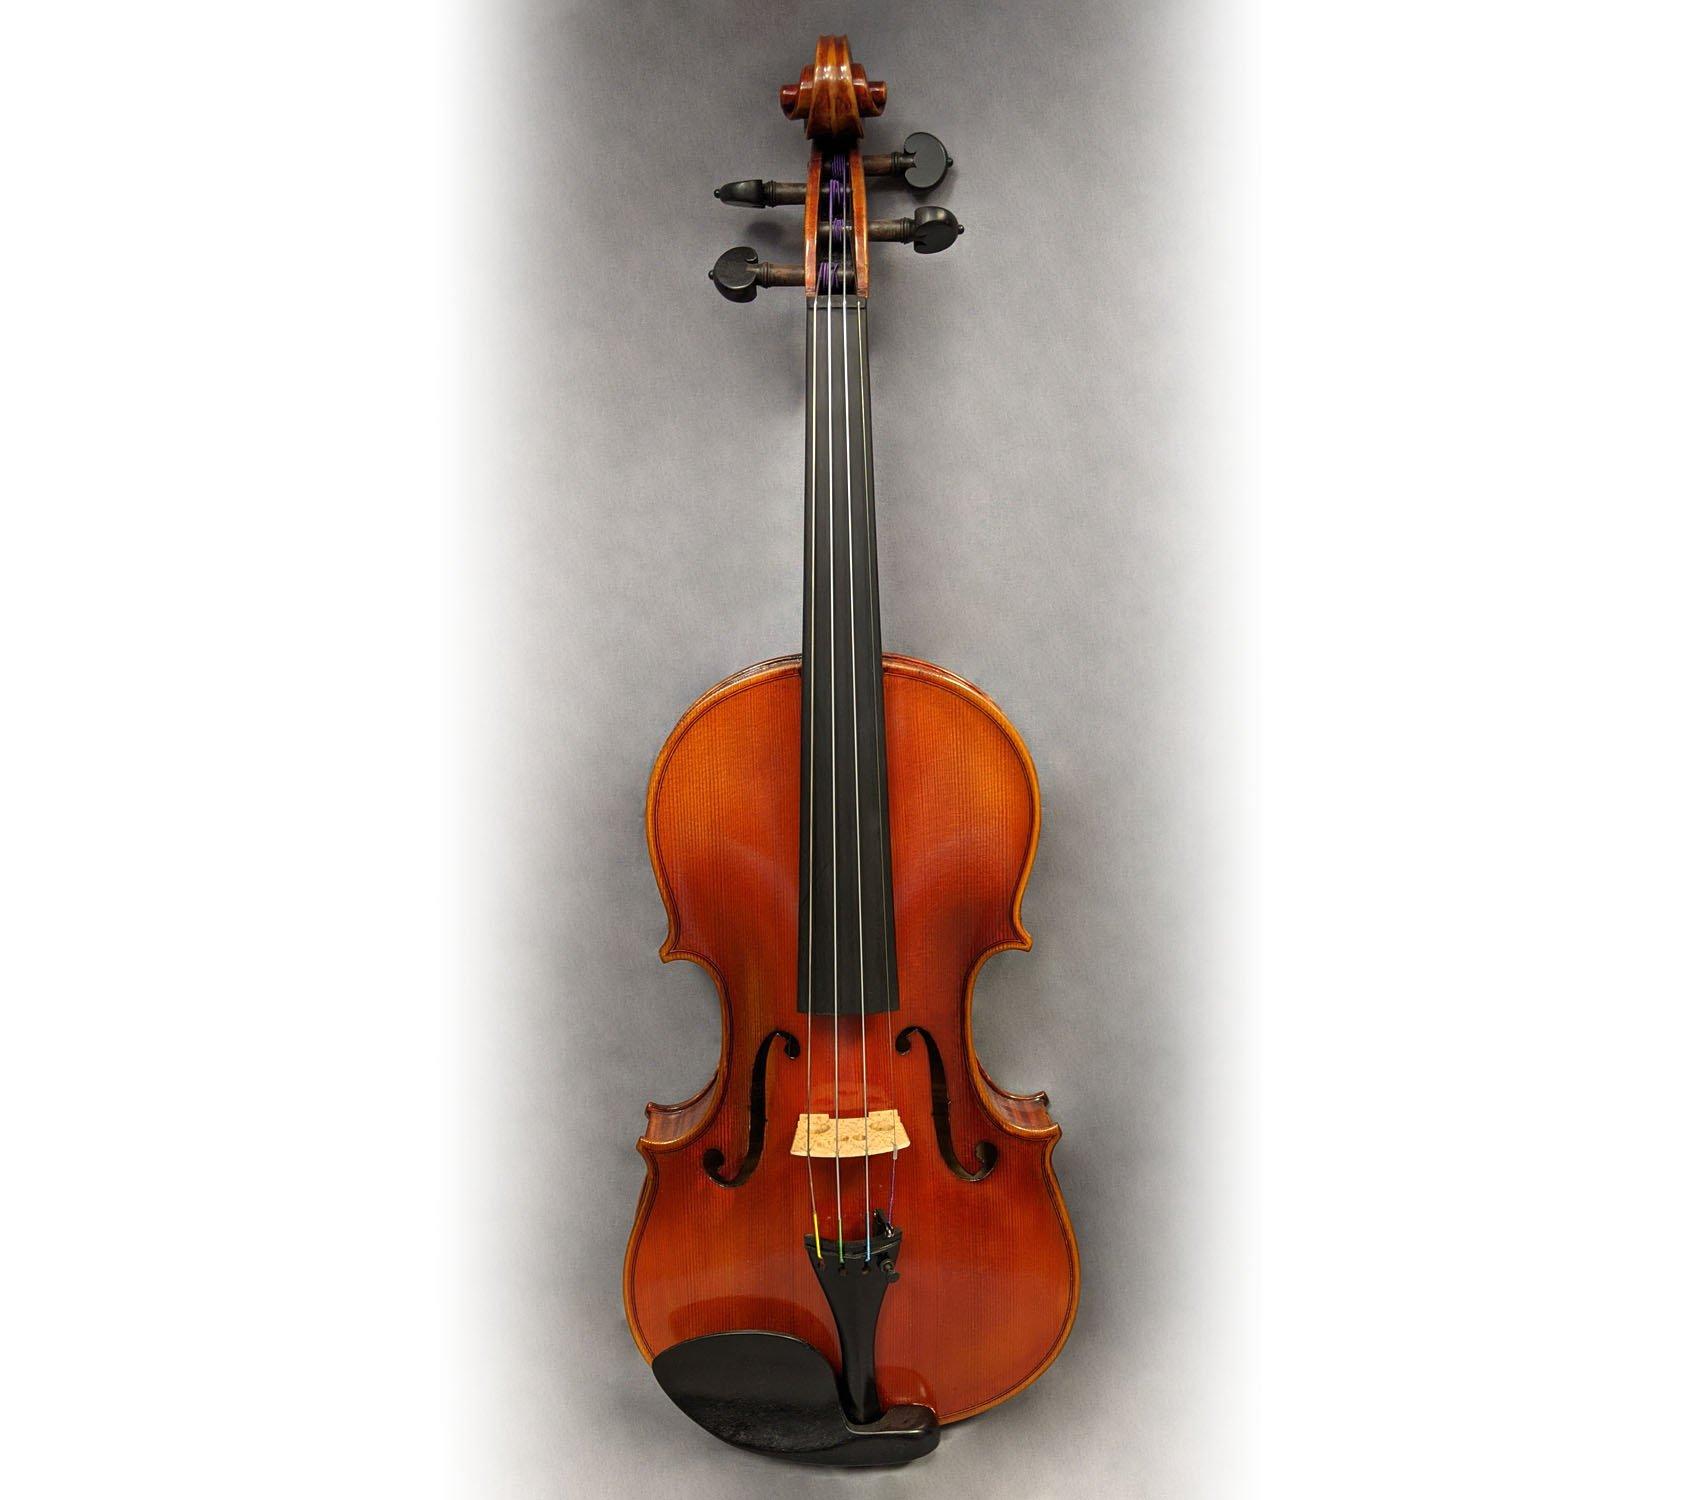 FirePhoenix FV400 4/4 Violin